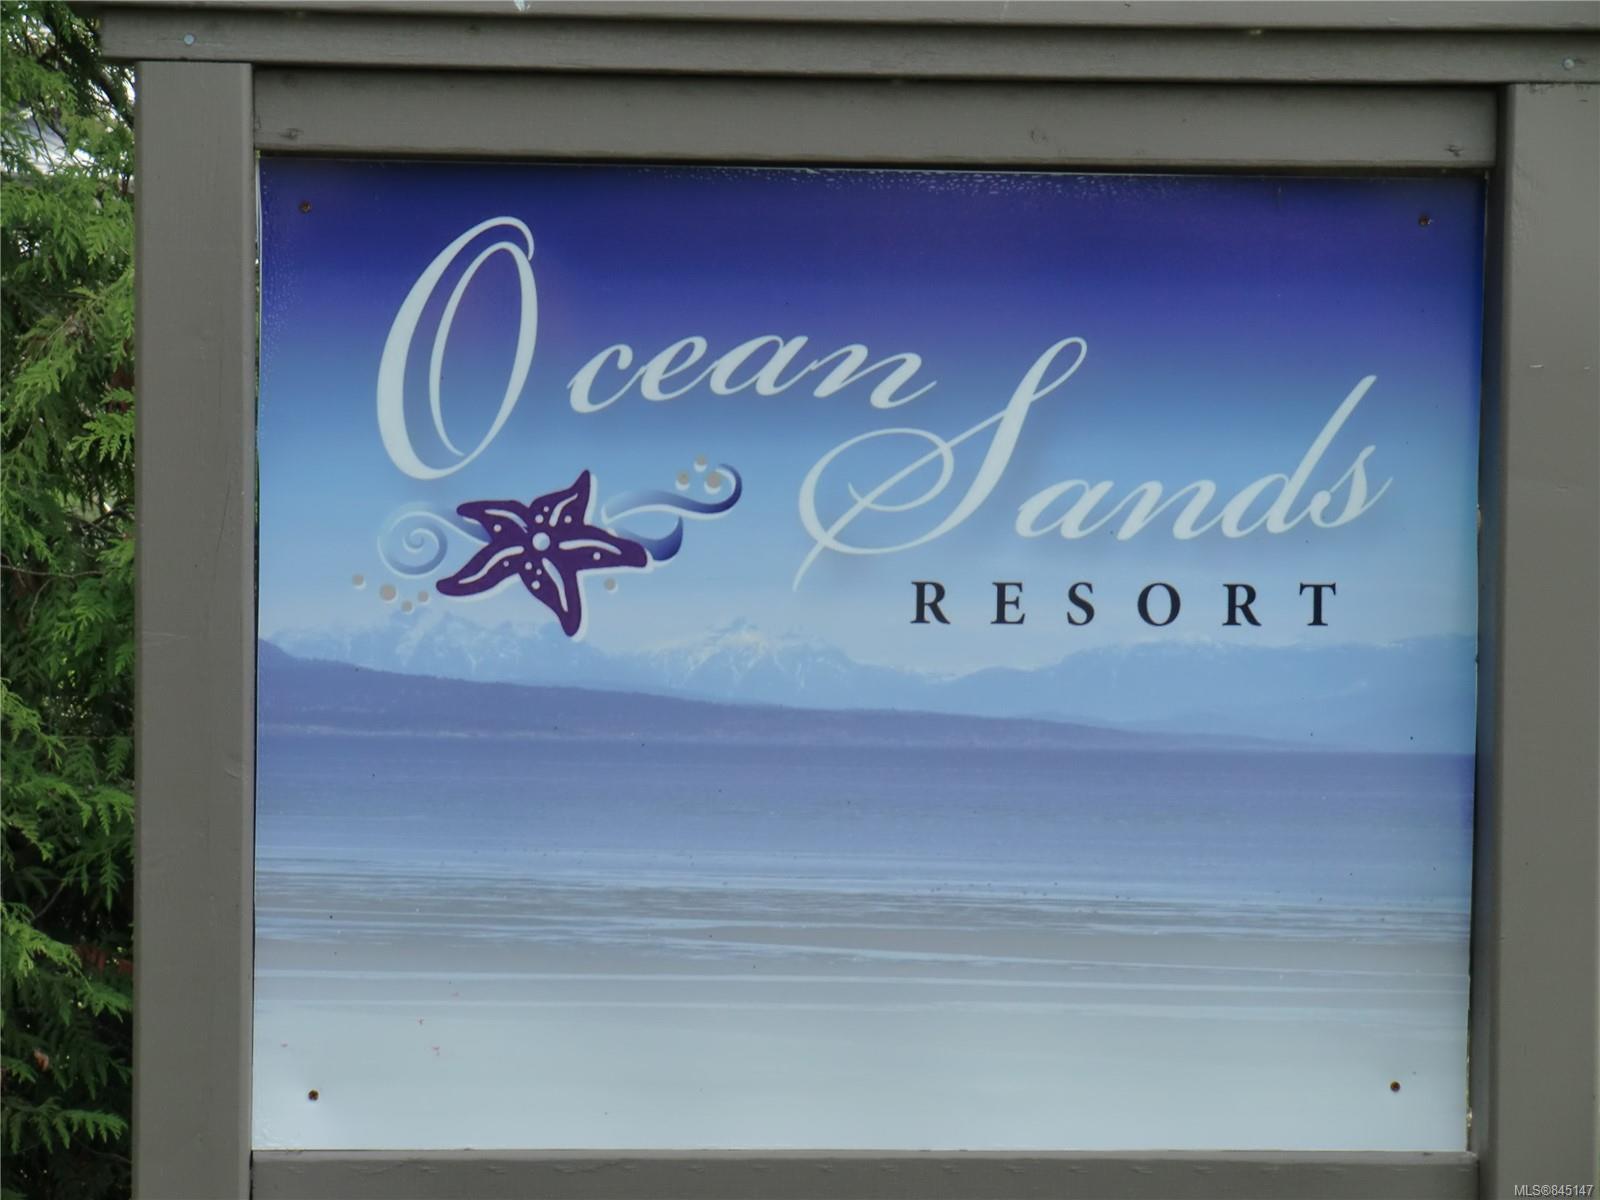 Main Photo: 37 1165 Resort Dr in PARKSVILLE: PQ Parksville Condo for sale (Parksville/Qualicum)  : MLS®# 845147